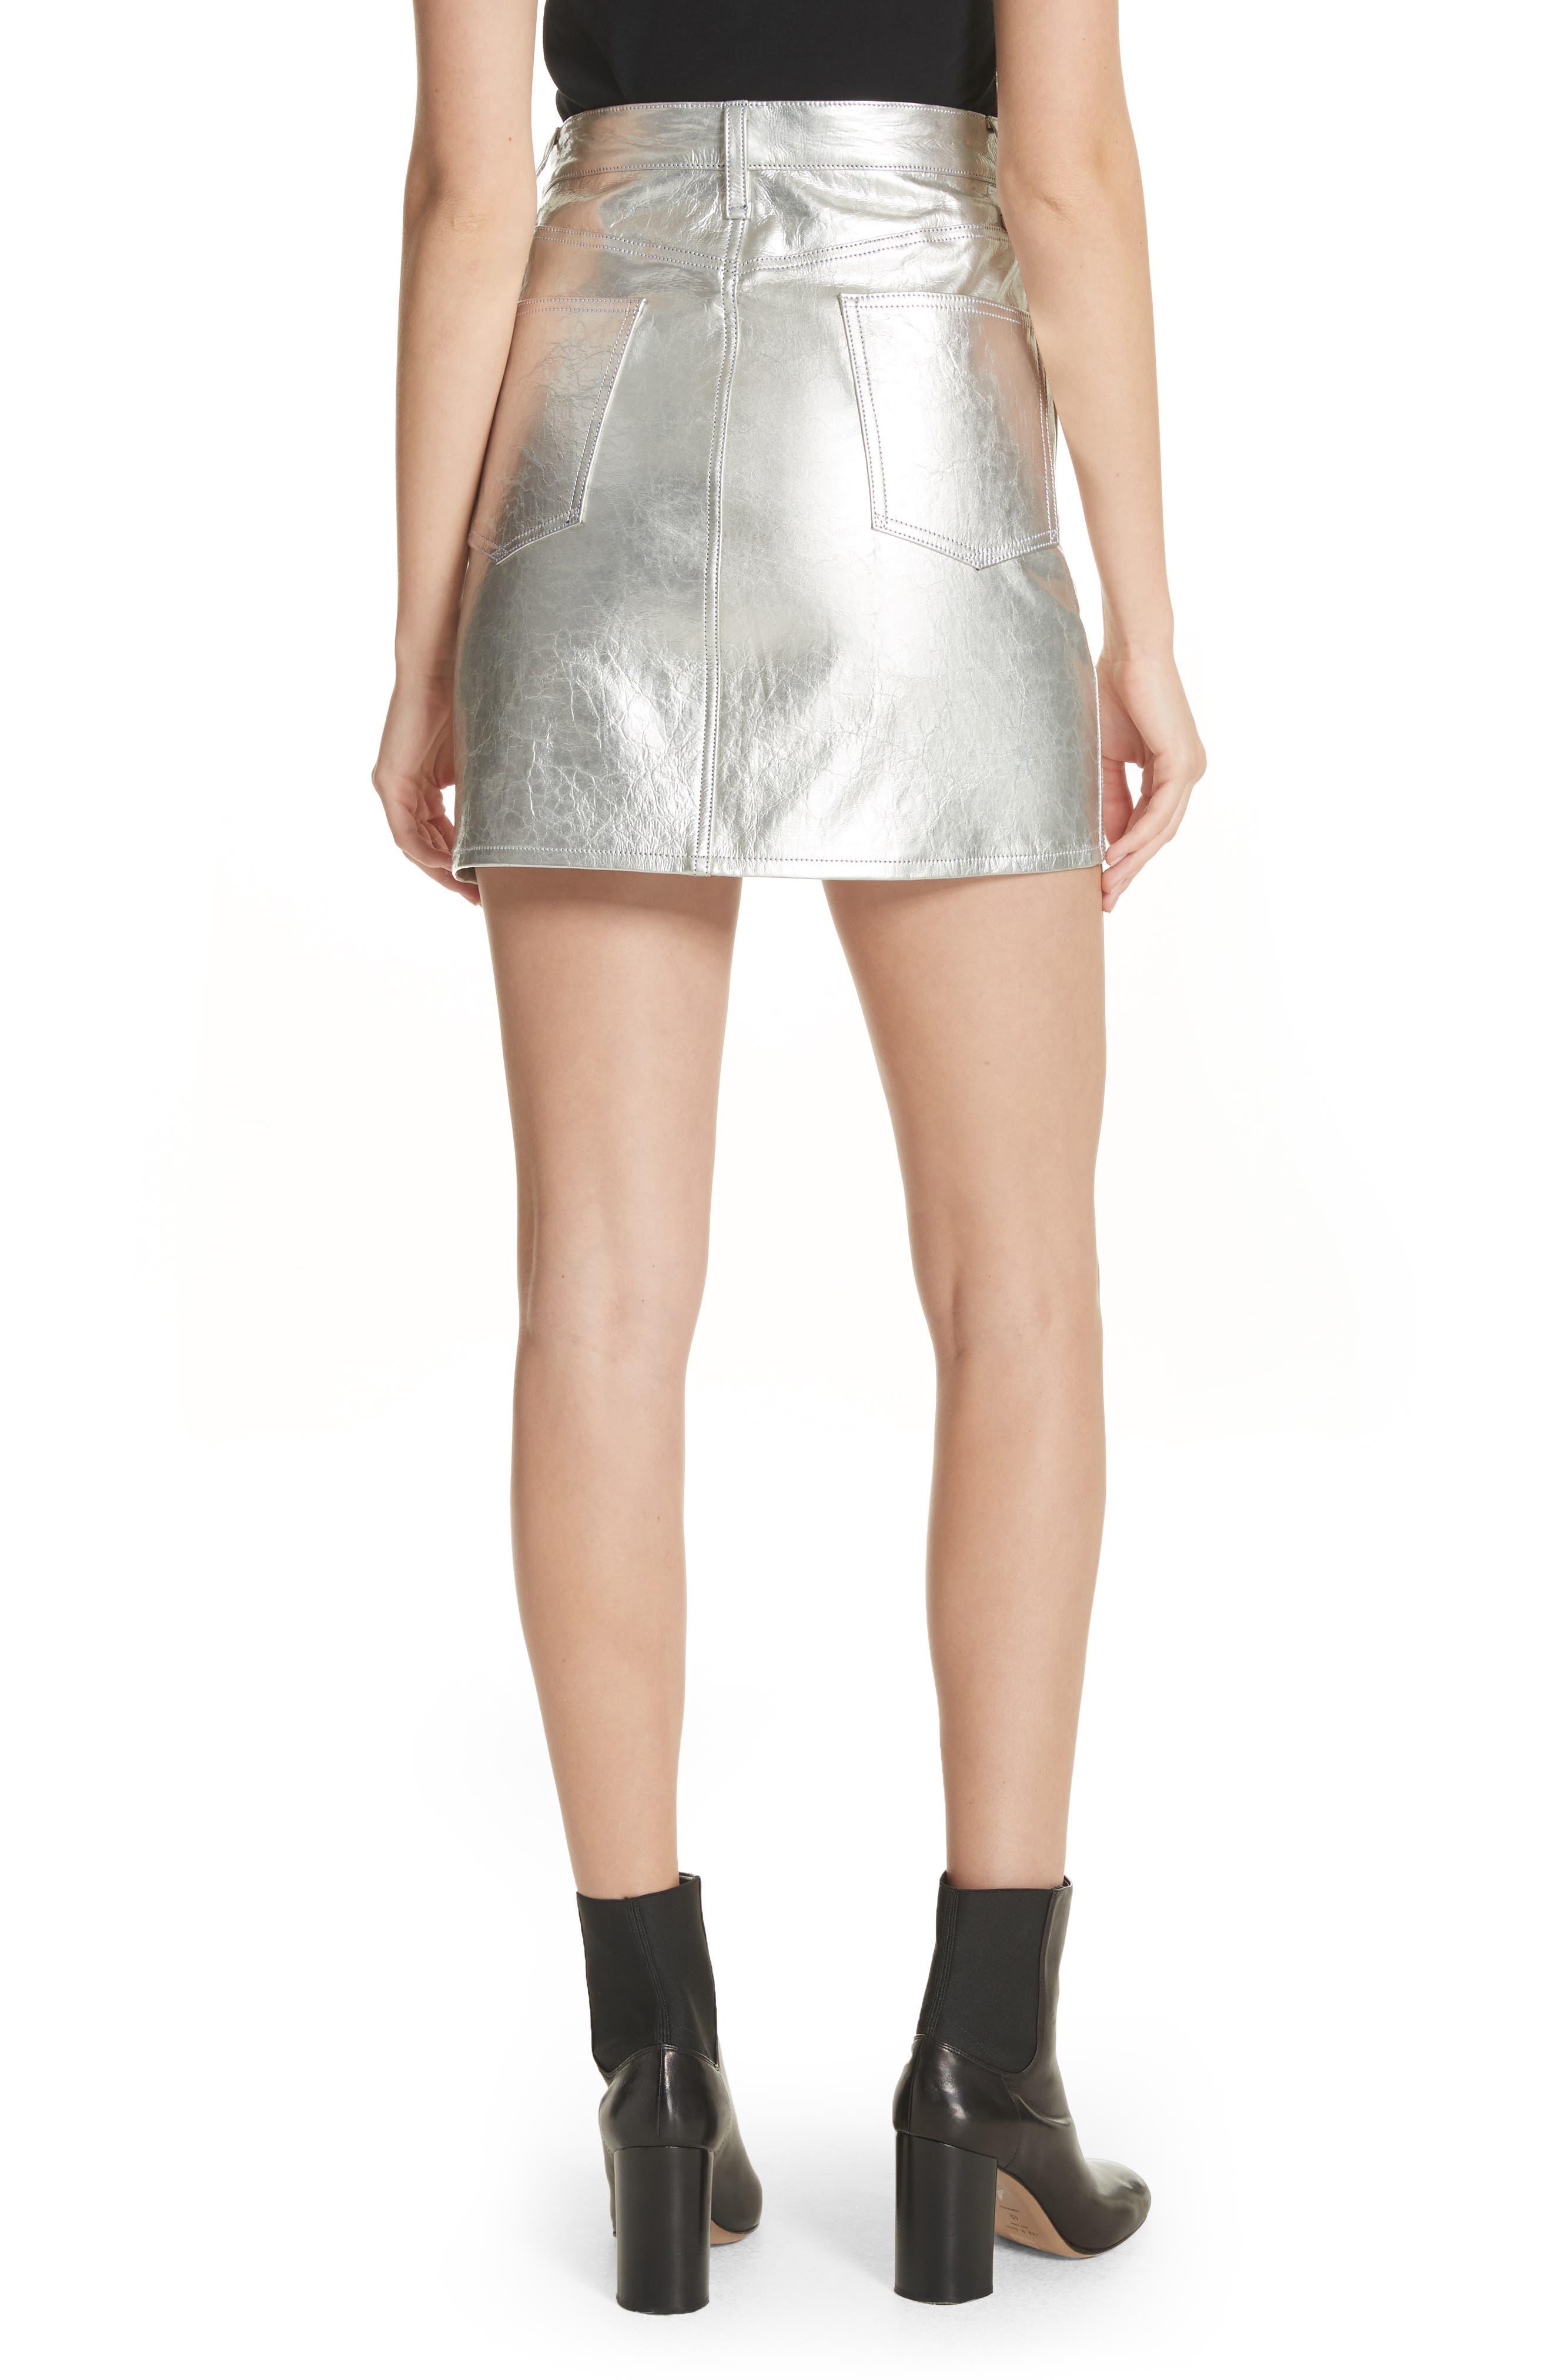 Moss High Waist Leather Miniskirt,                             Alternate thumbnail 2, color,                             041